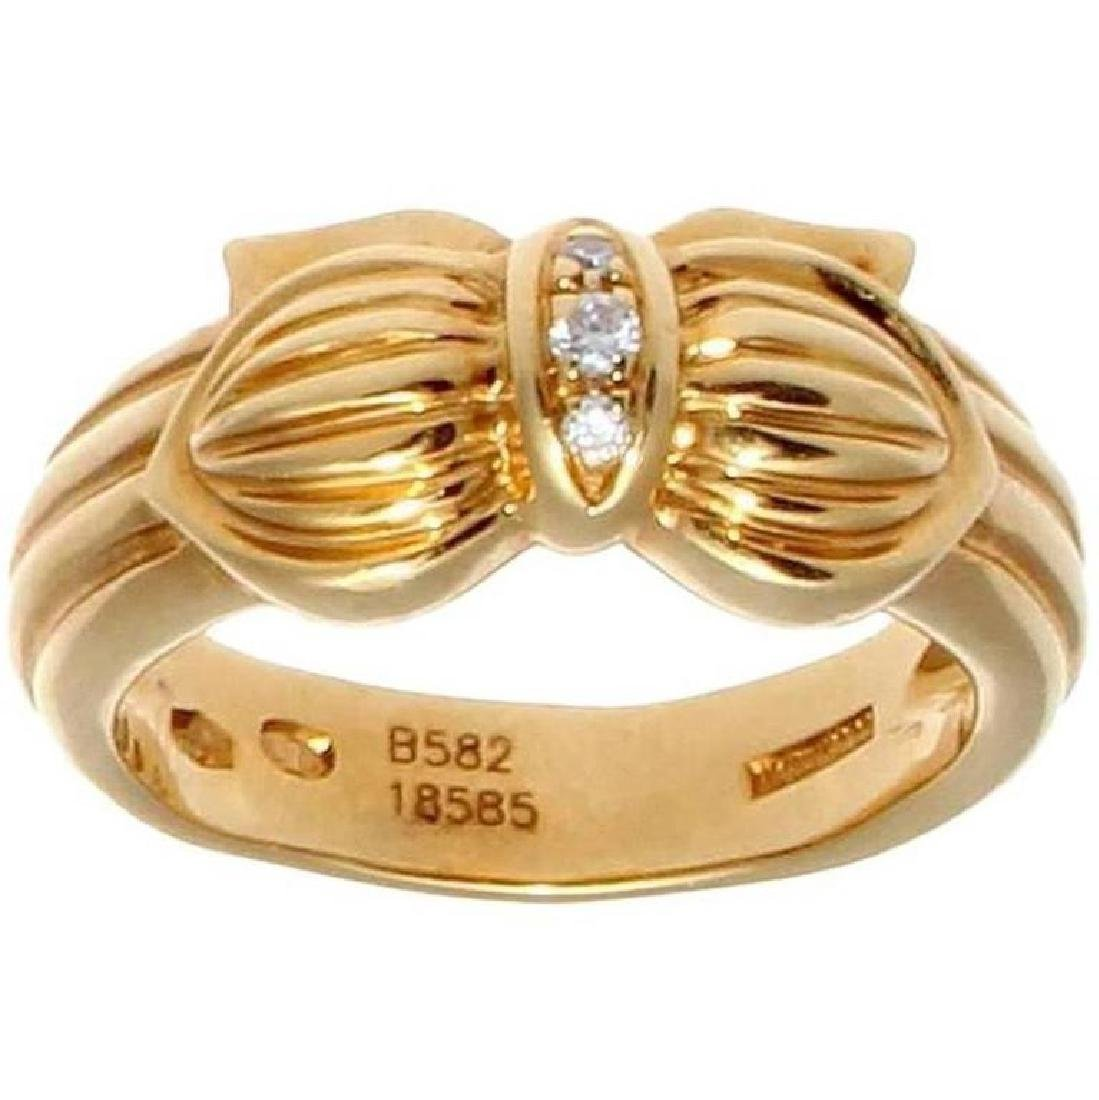 Boucheron 18K Gold Diamond Ring